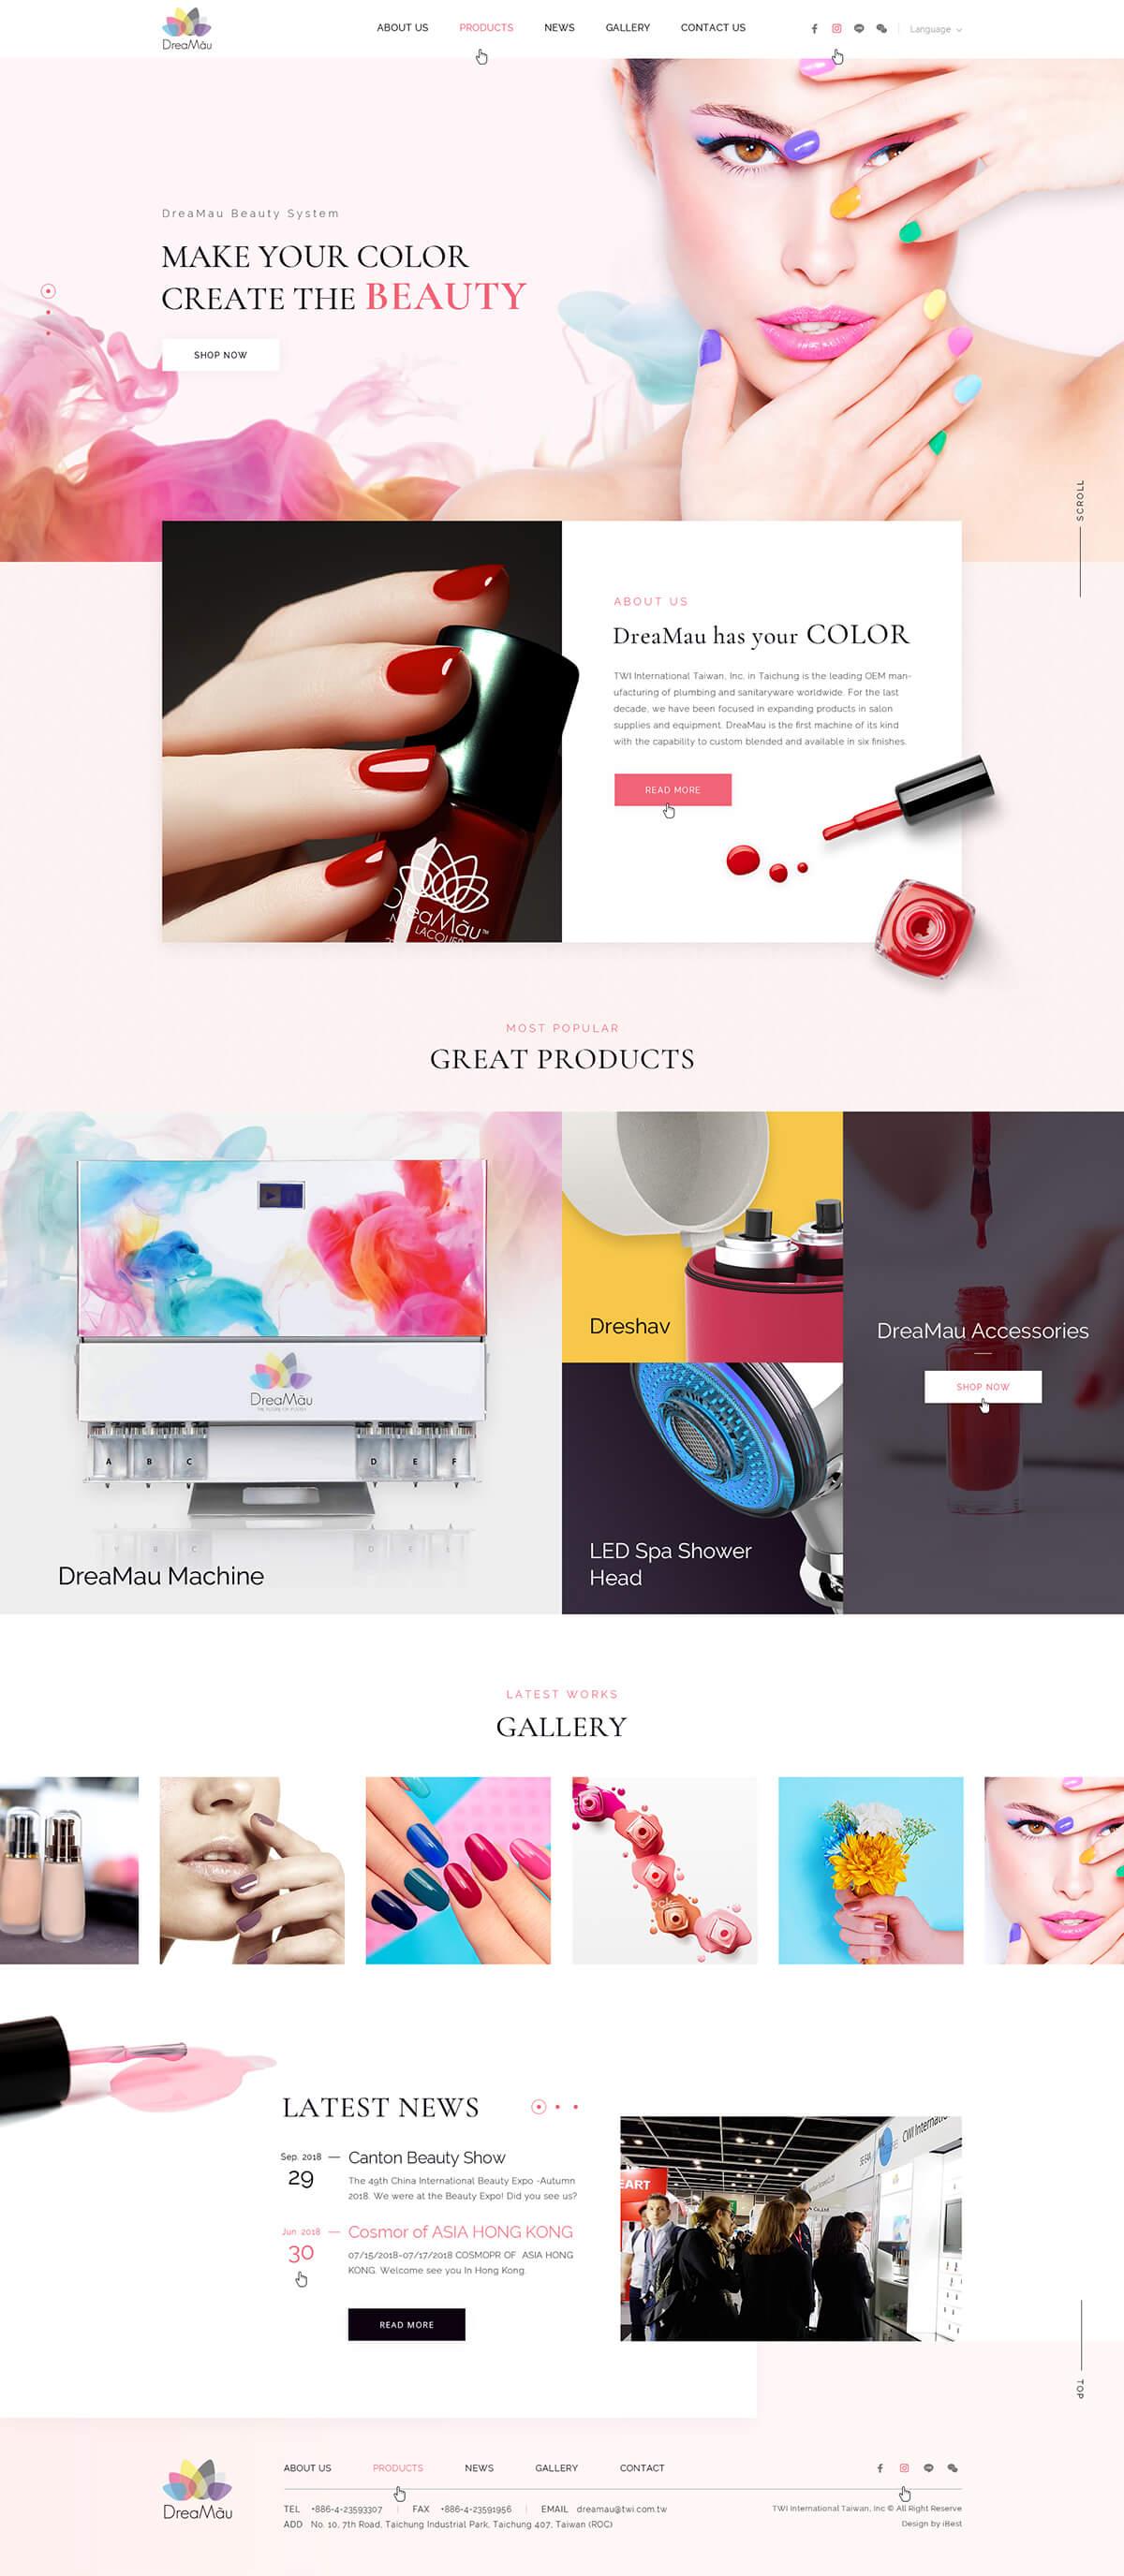 DreaMau-網頁設計